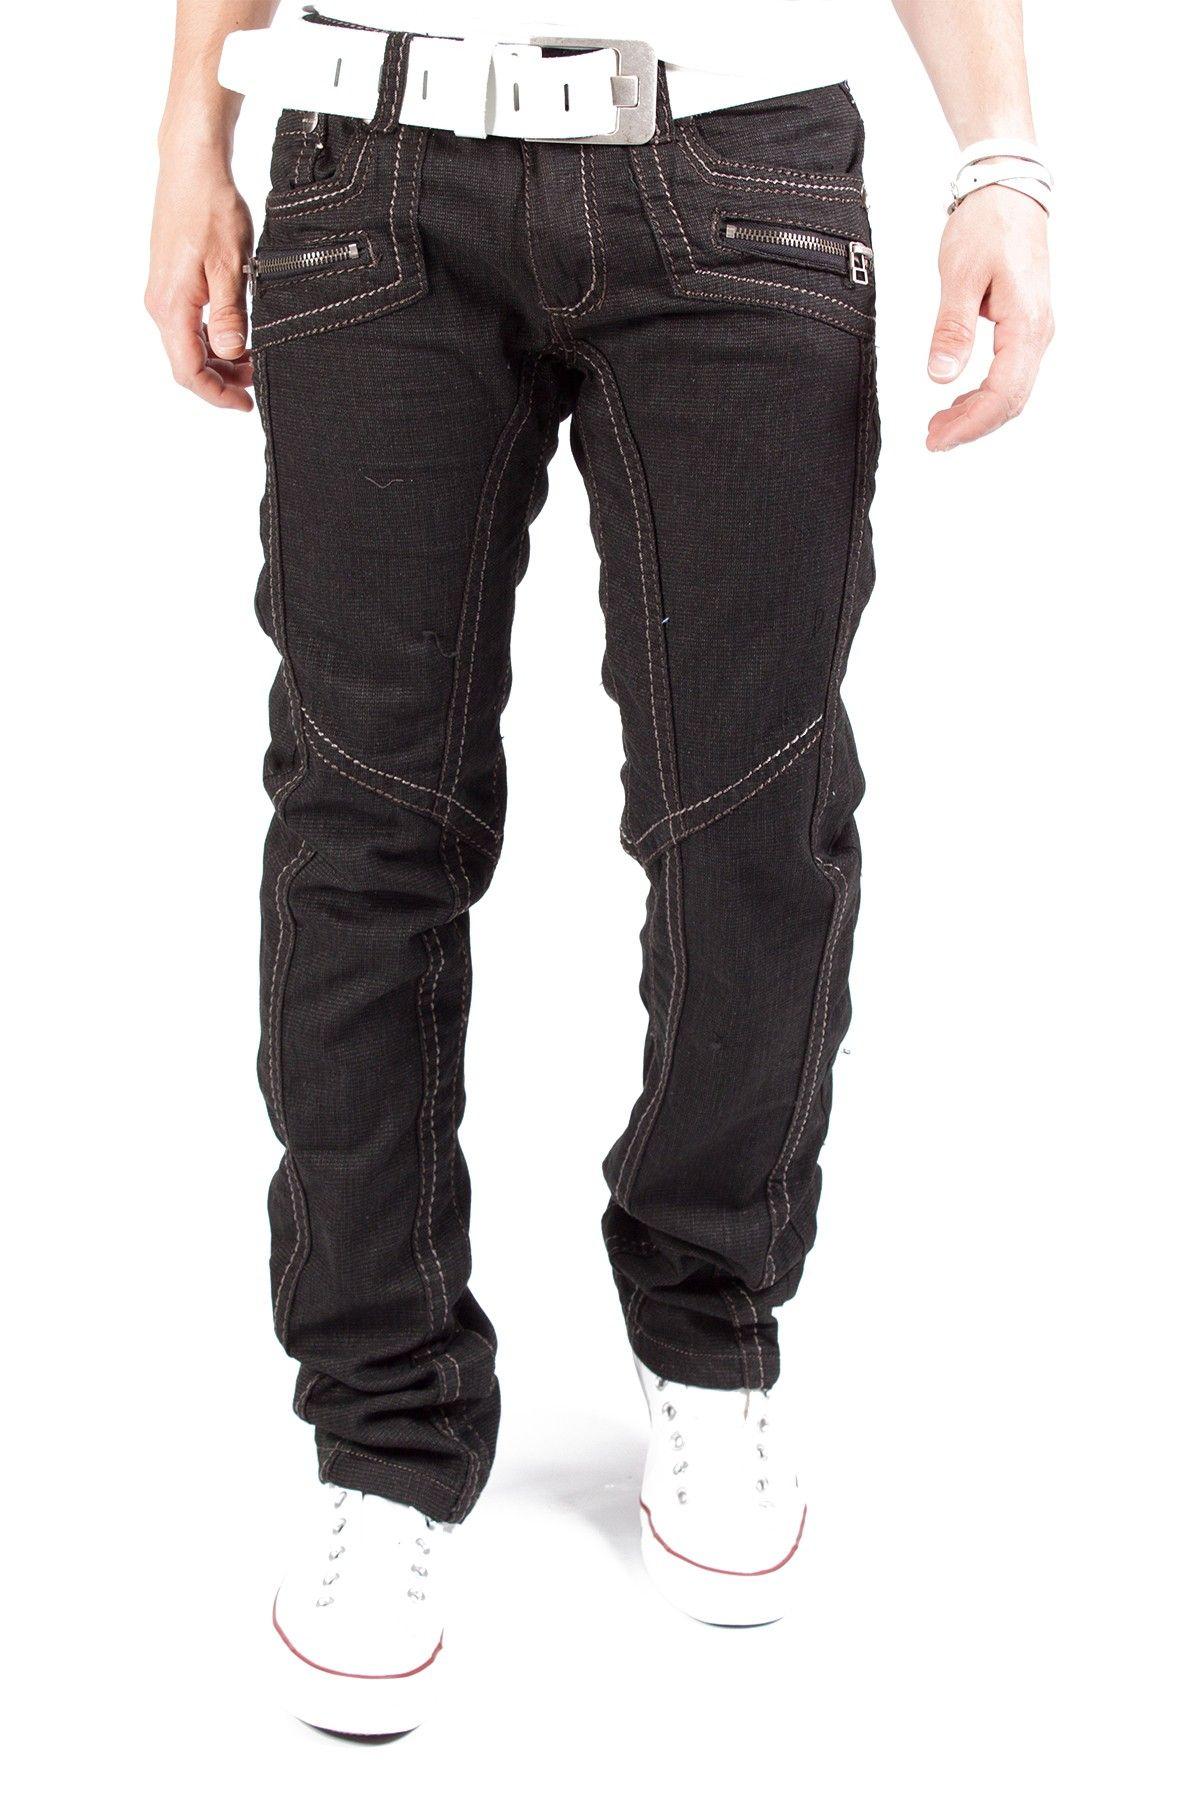 Kosmo Lupo Zipper Jeans Schwarz Km022 1S1H.DE - www.1s1h.de kosmo ... 7074ee388e